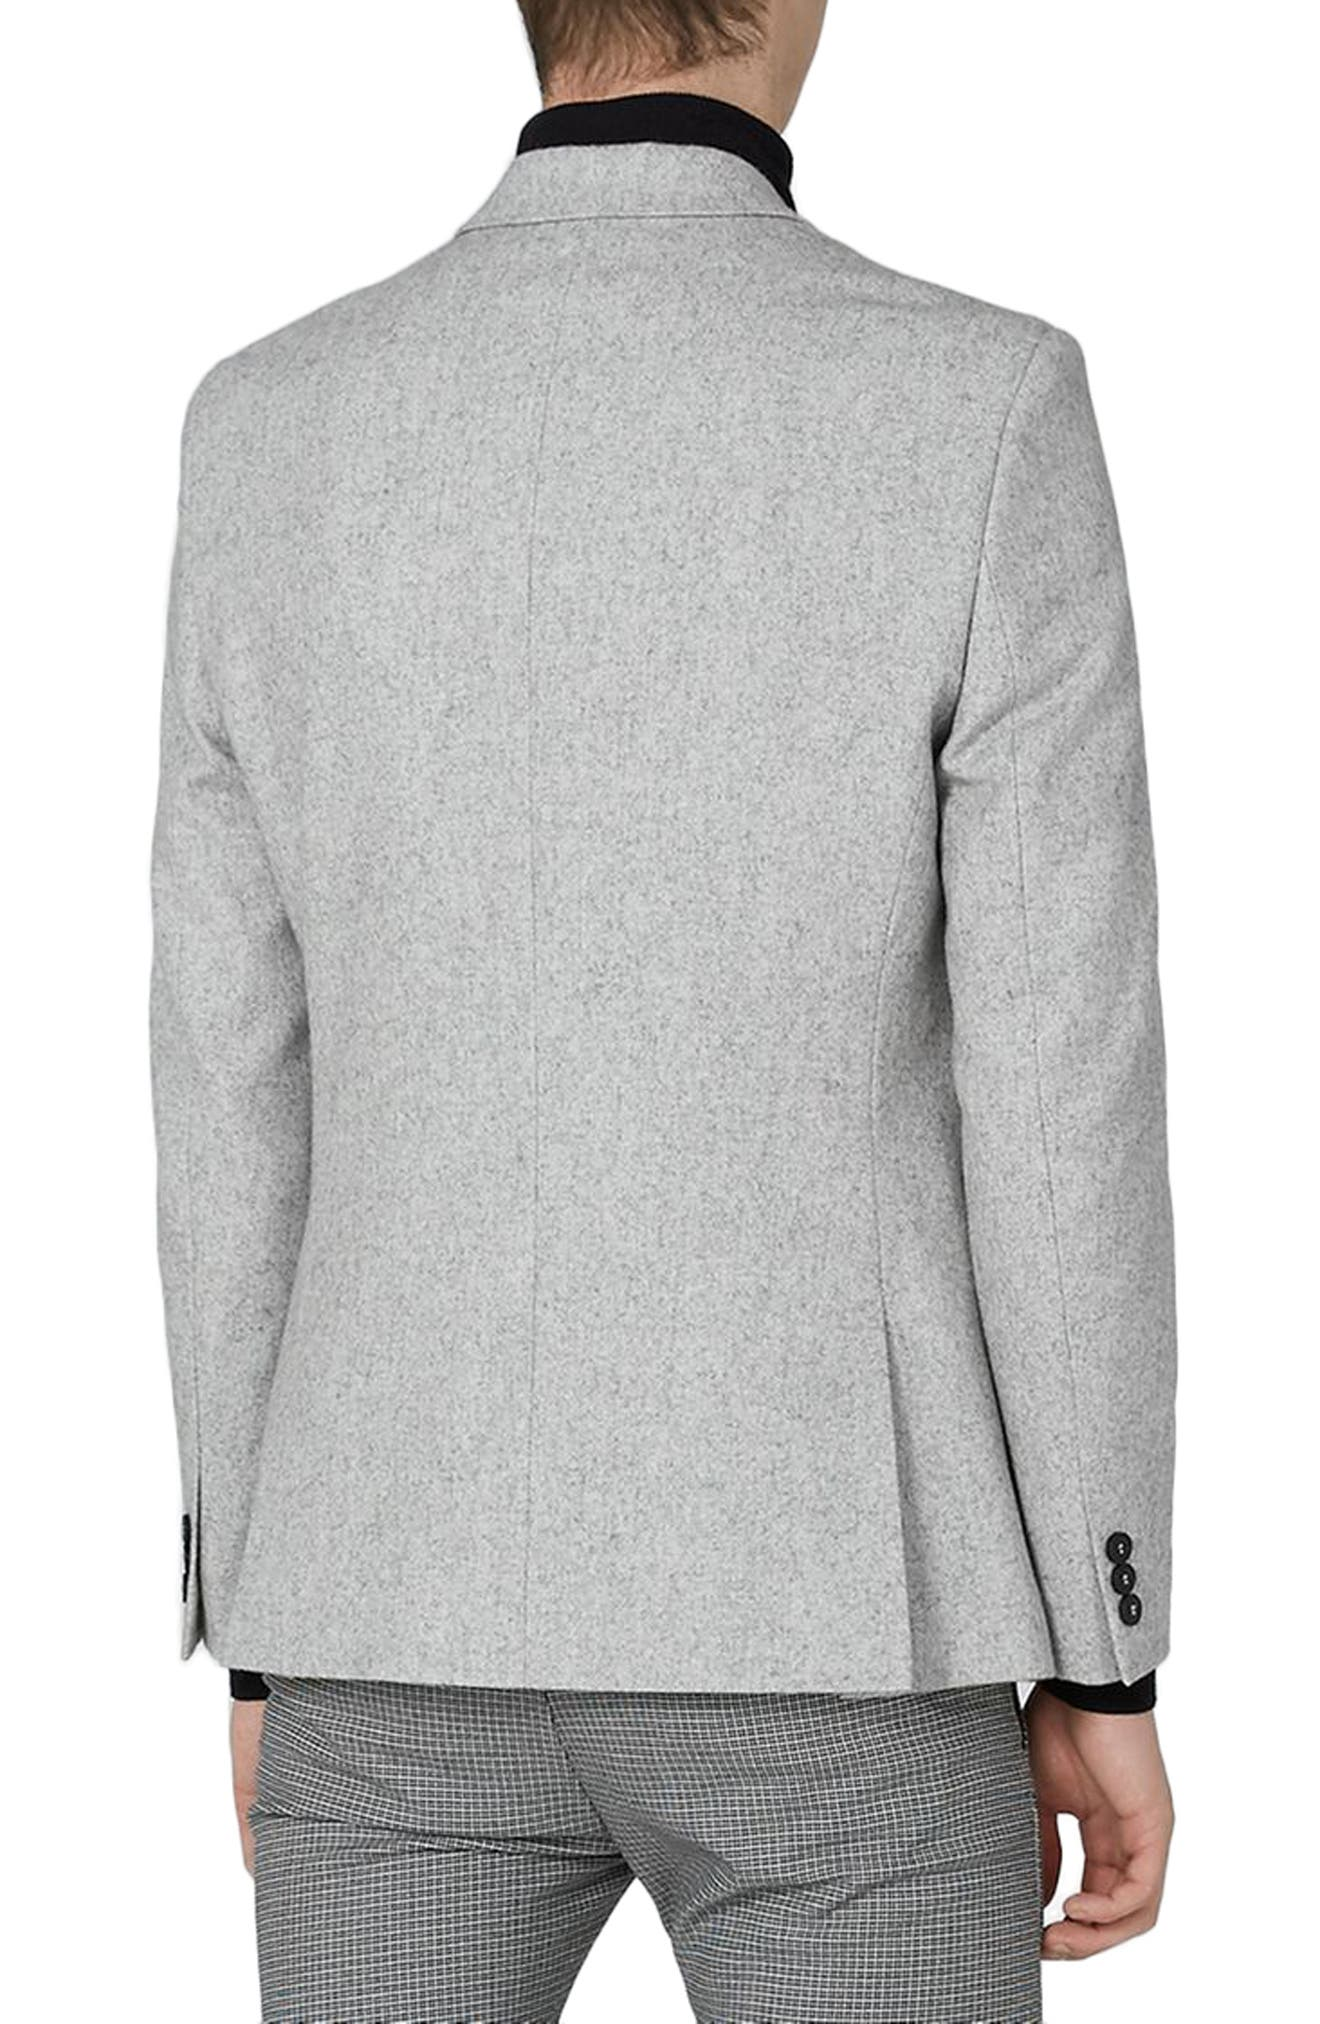 Murdoch One-Button Jacket,                             Alternate thumbnail 2, color,                             LIGHT GREY